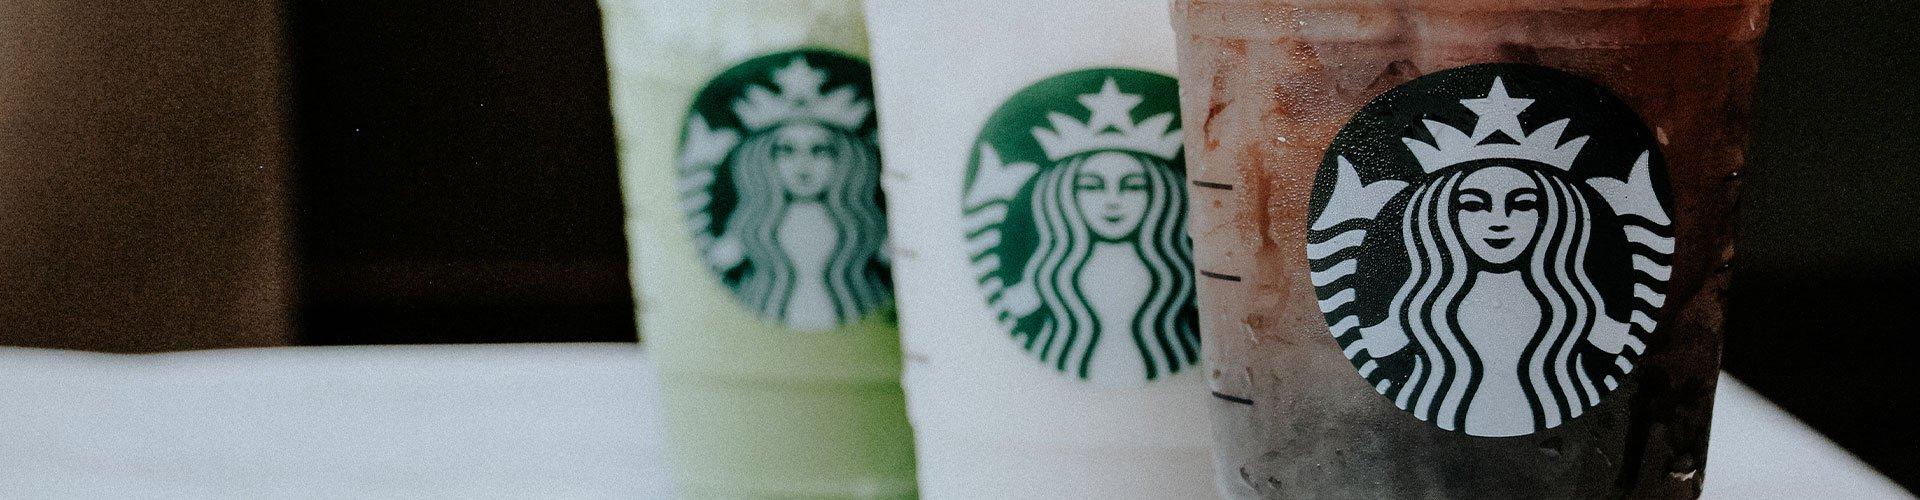 Starbucks UNT themed drinks